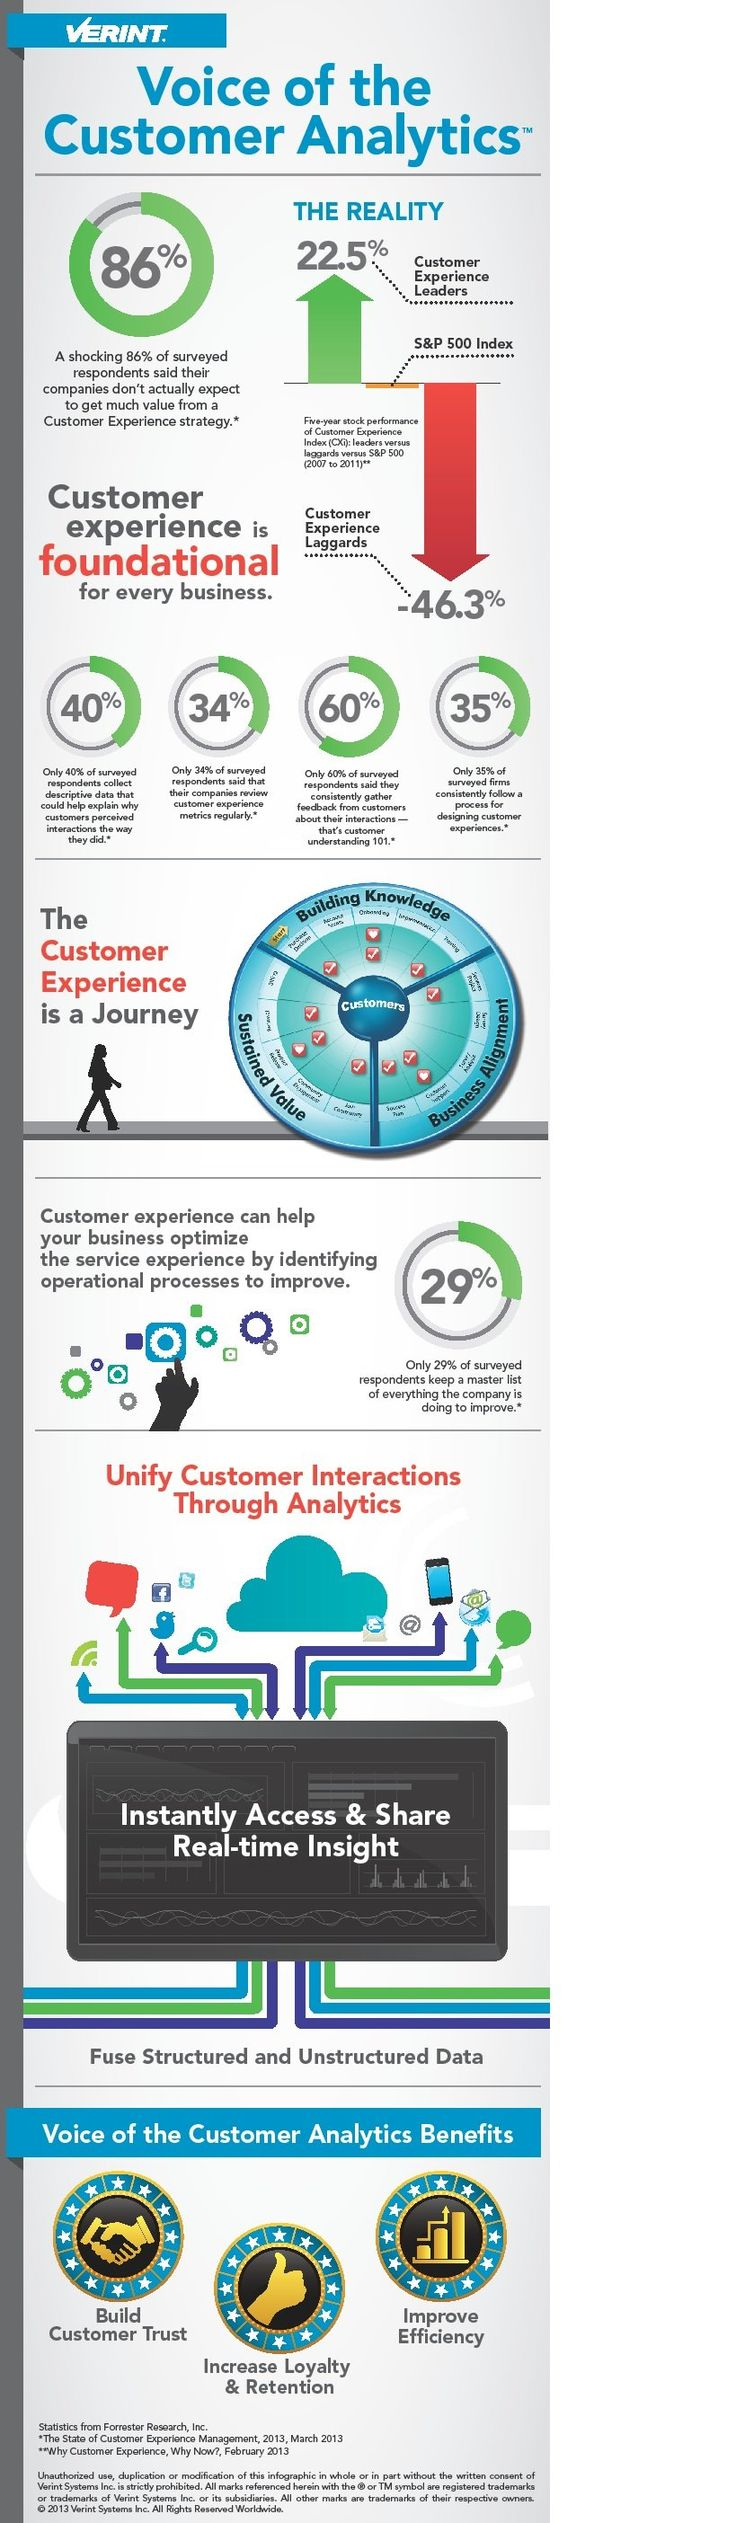 77 best Great Infographics images on Pinterest | Inbound marketing ...